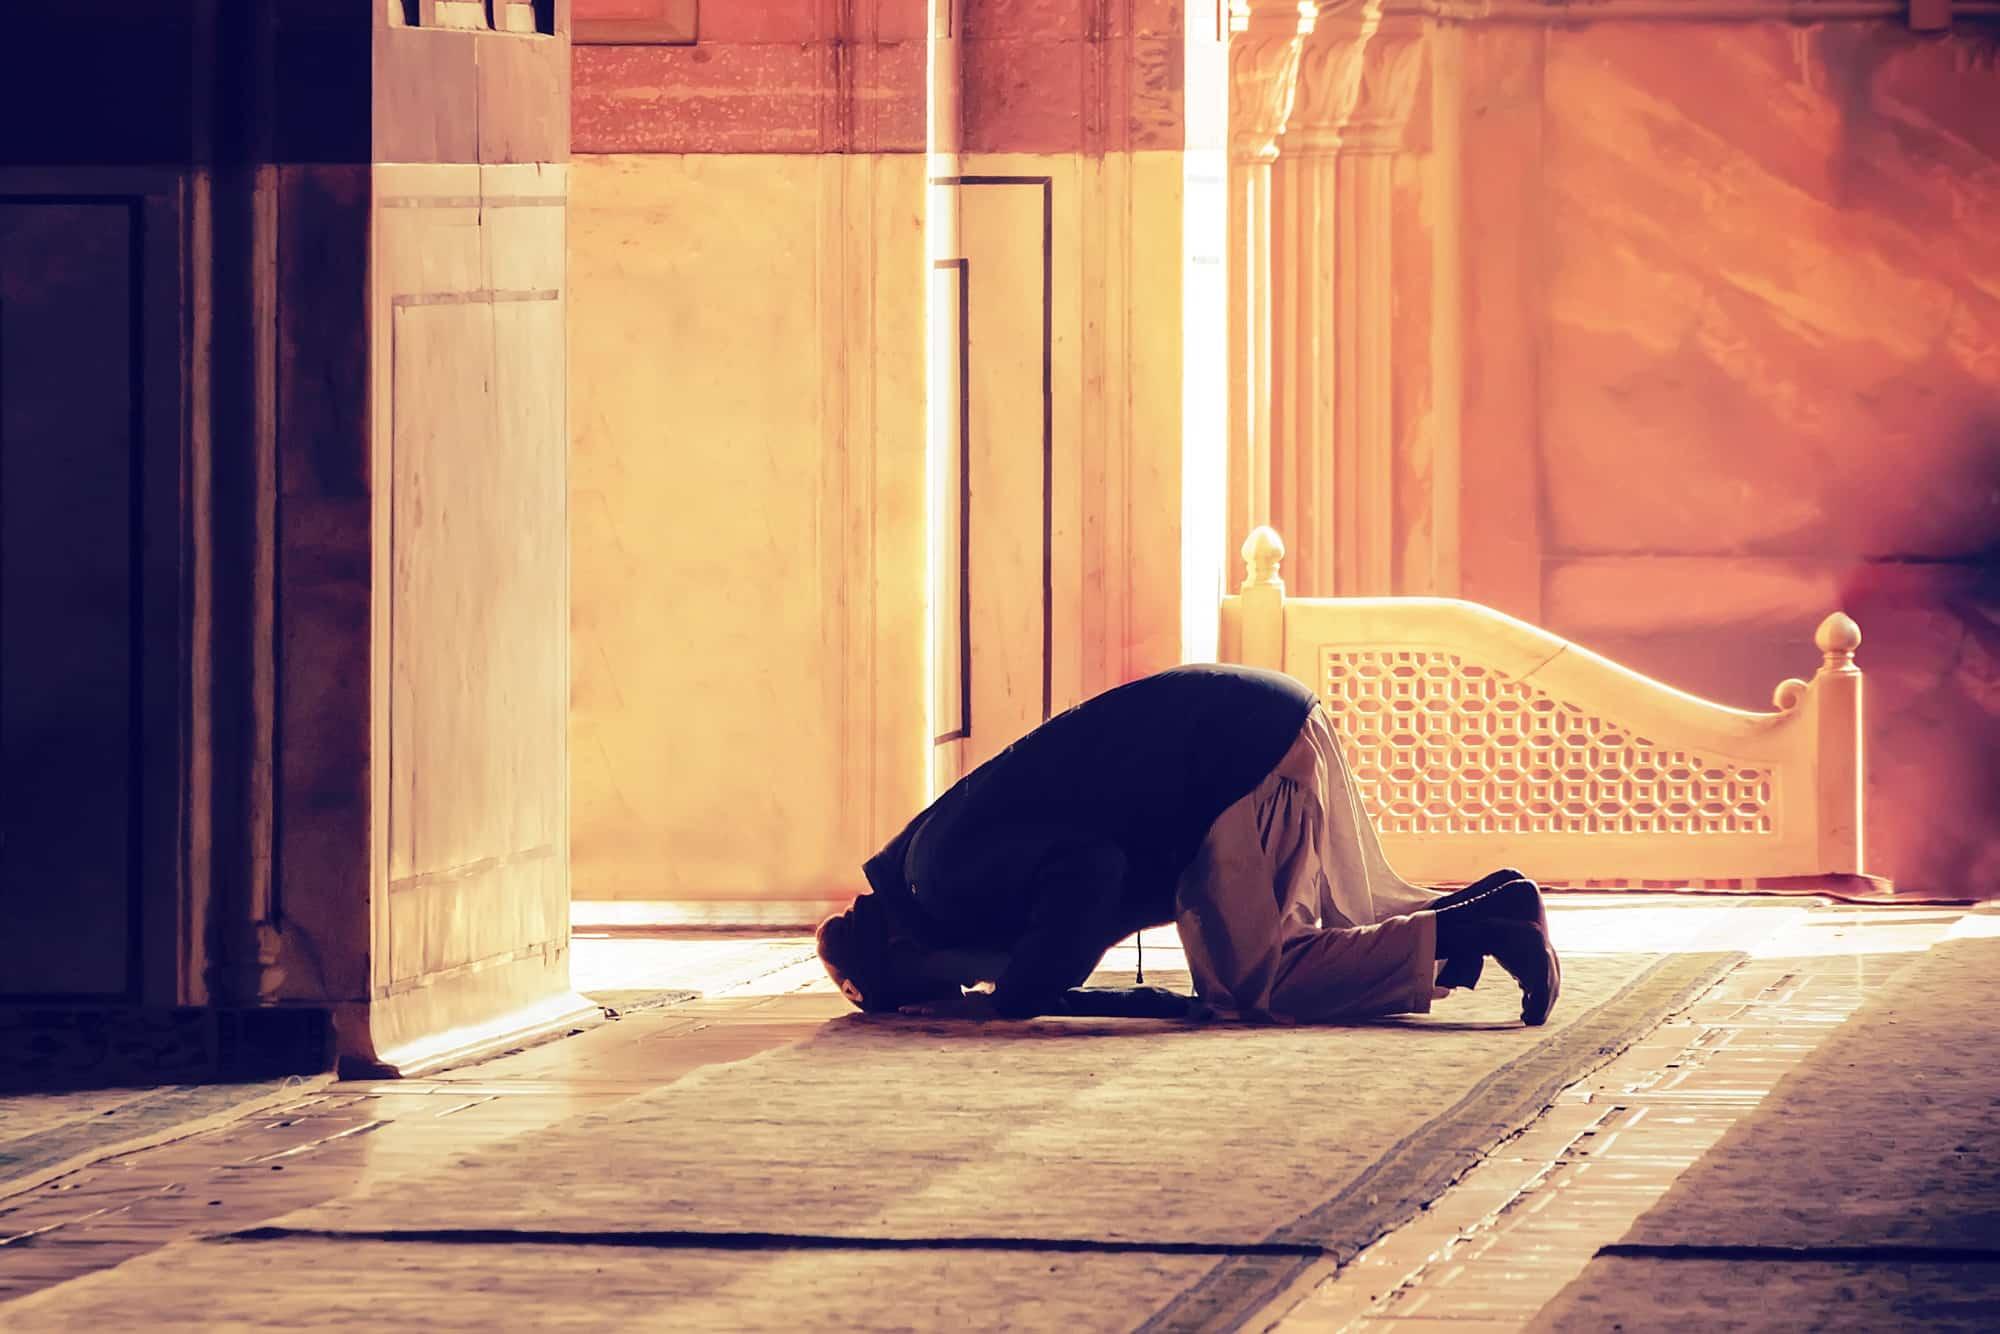 Nos adorations corrigent nos imperfections en islam par cheikh Mohamed Hendaz